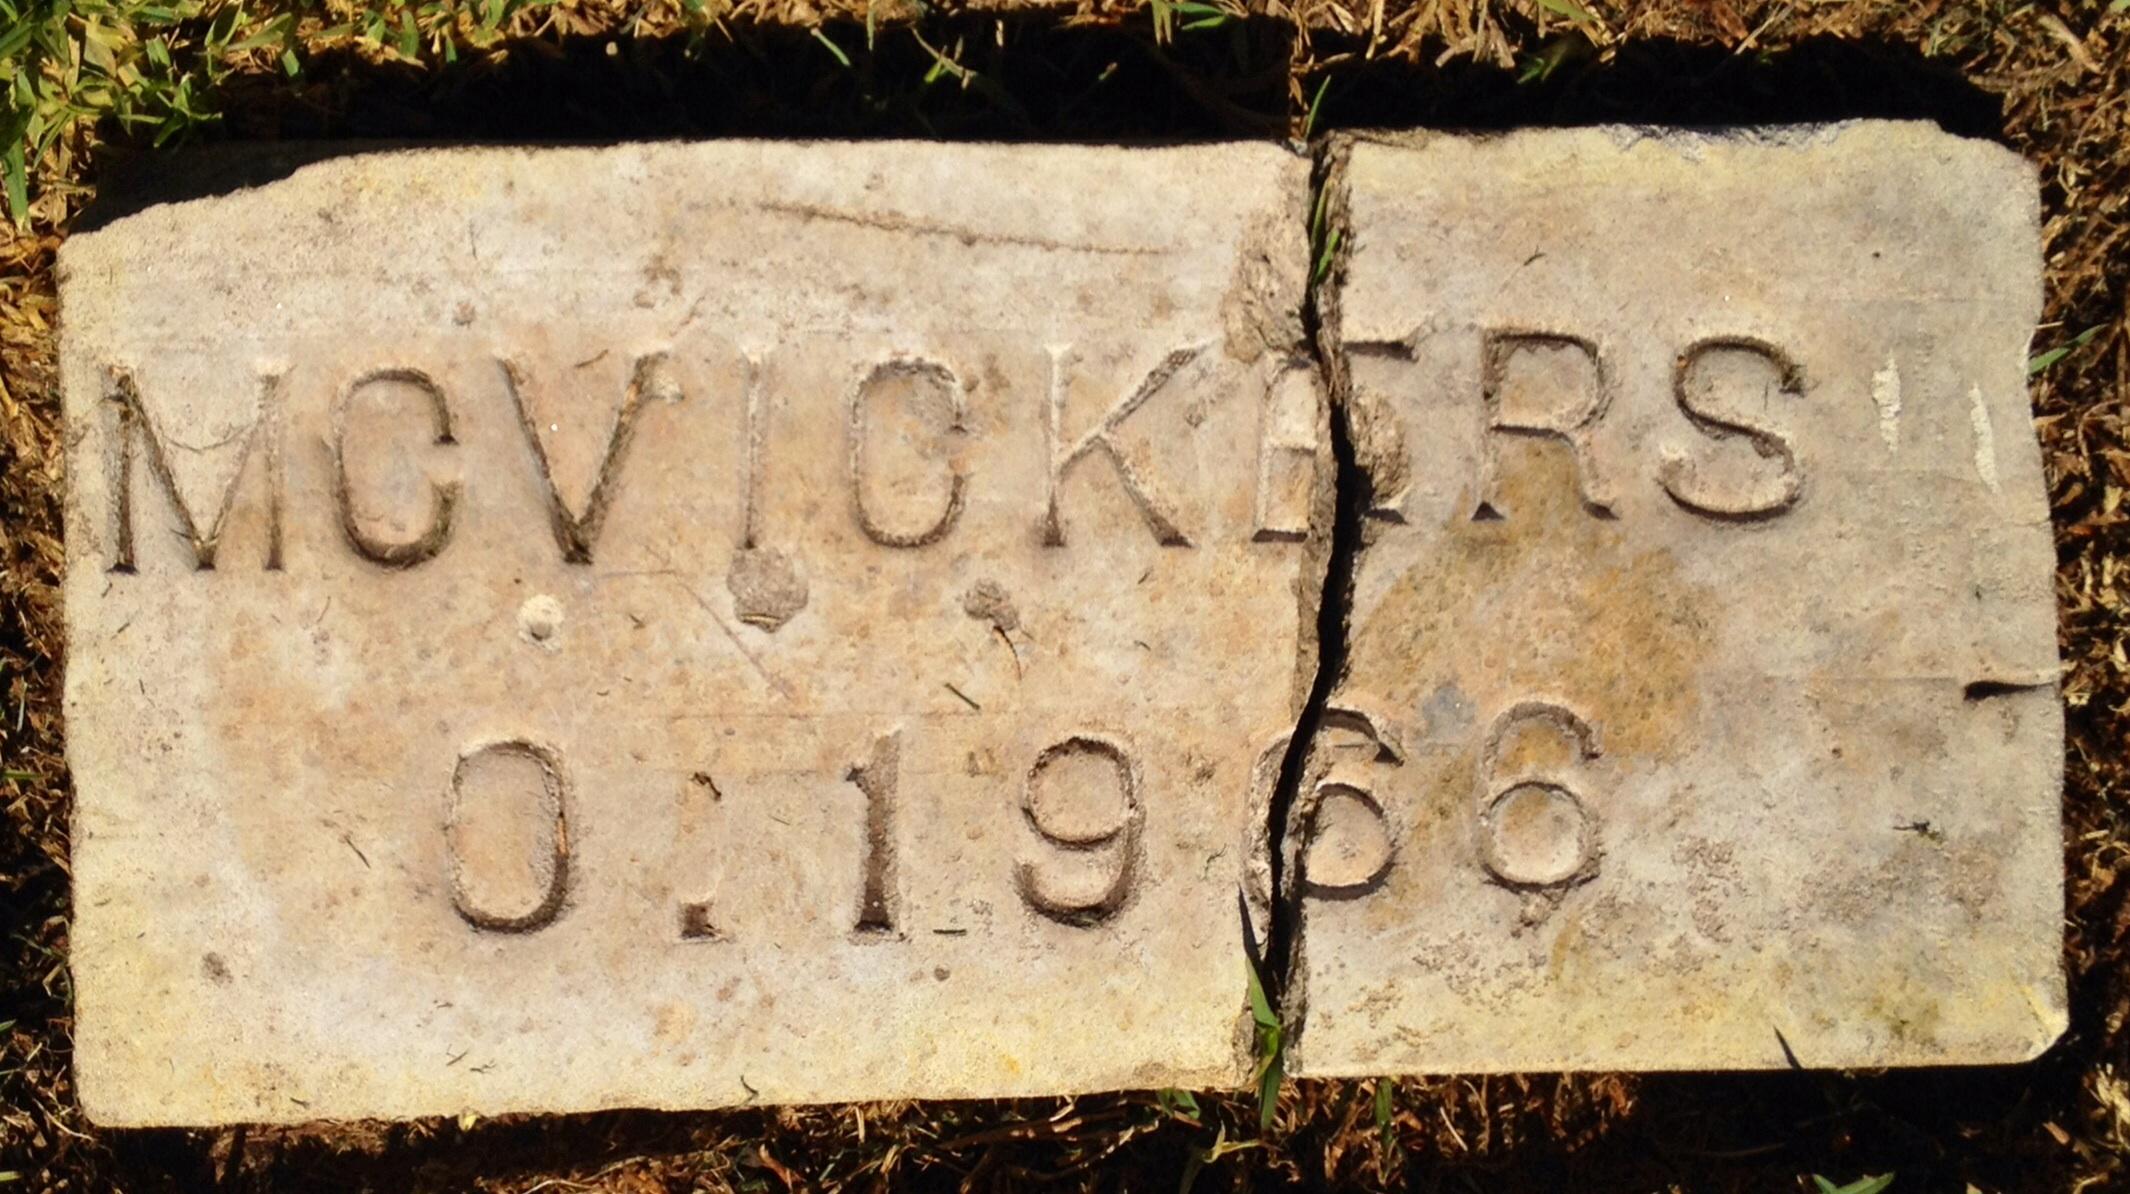 Oran M McVicker